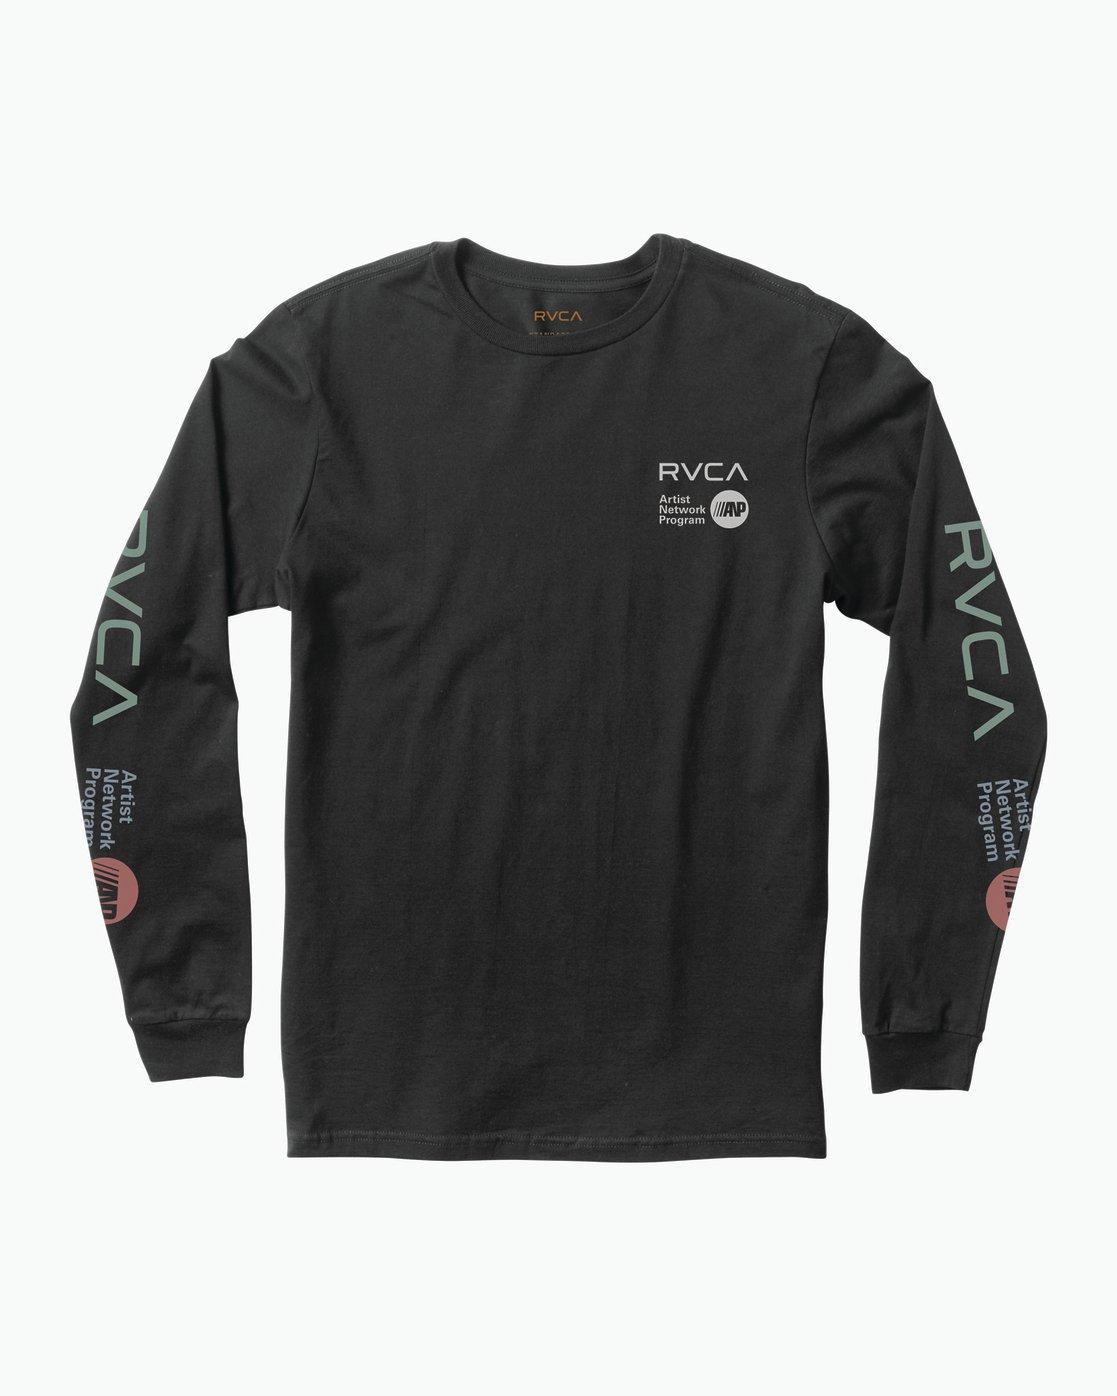 0 RVCA ANP Long Sleeve T-Shirt  M451SRRV RVCA